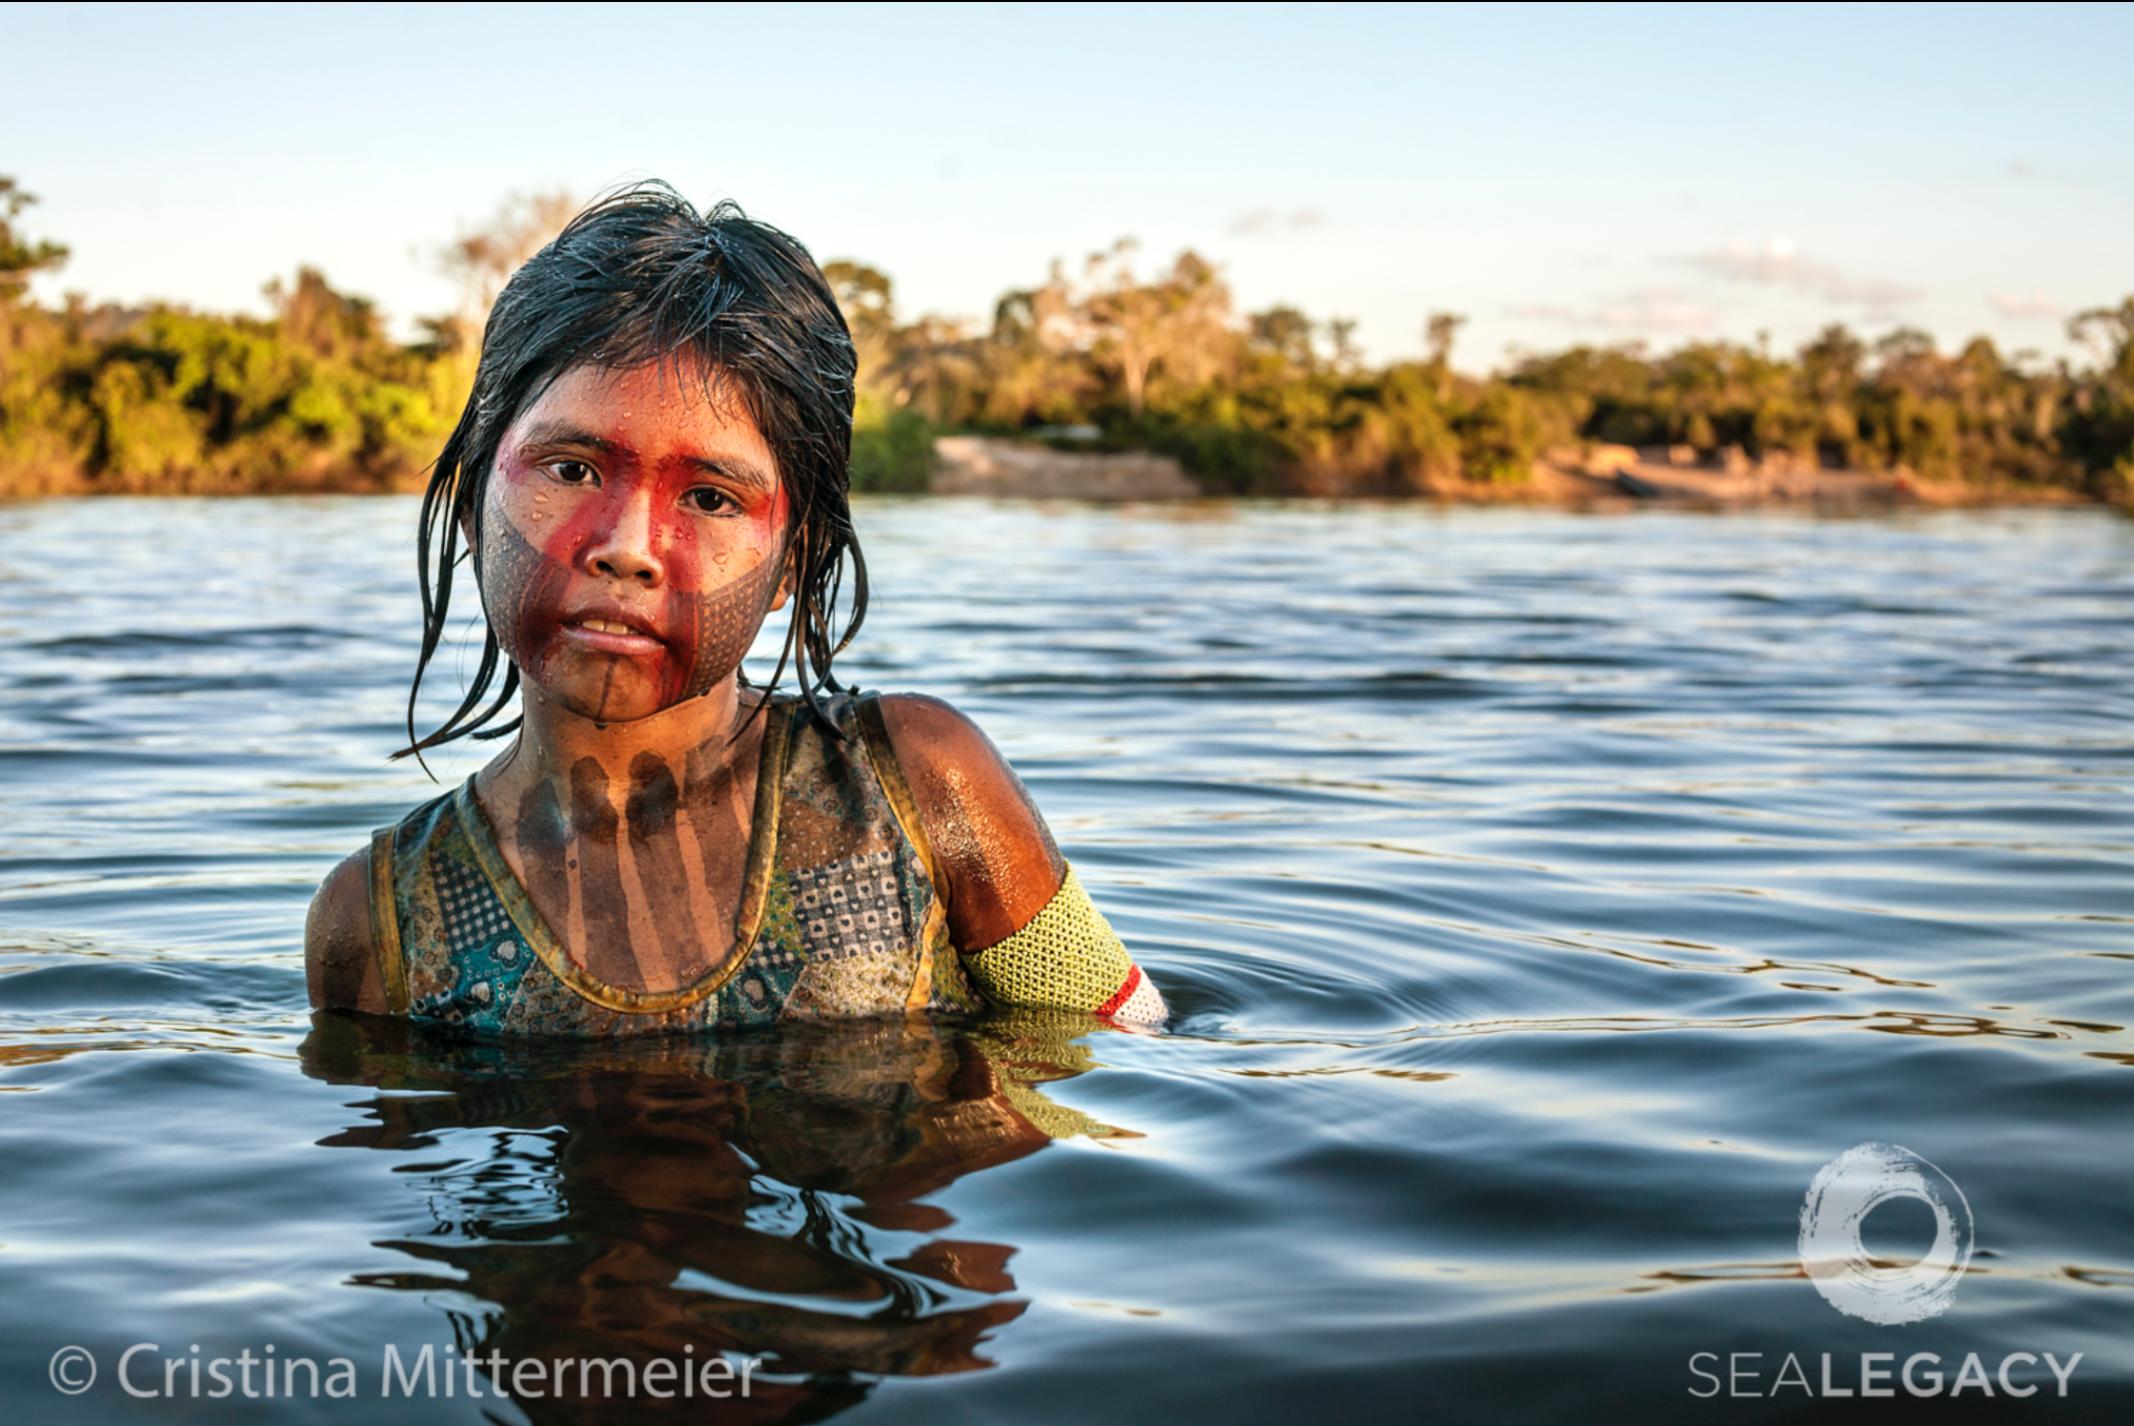 Cristina Mittermeier, Xingu  Digital Chromogenic Print on William Turner Cotton, 20x30 in.